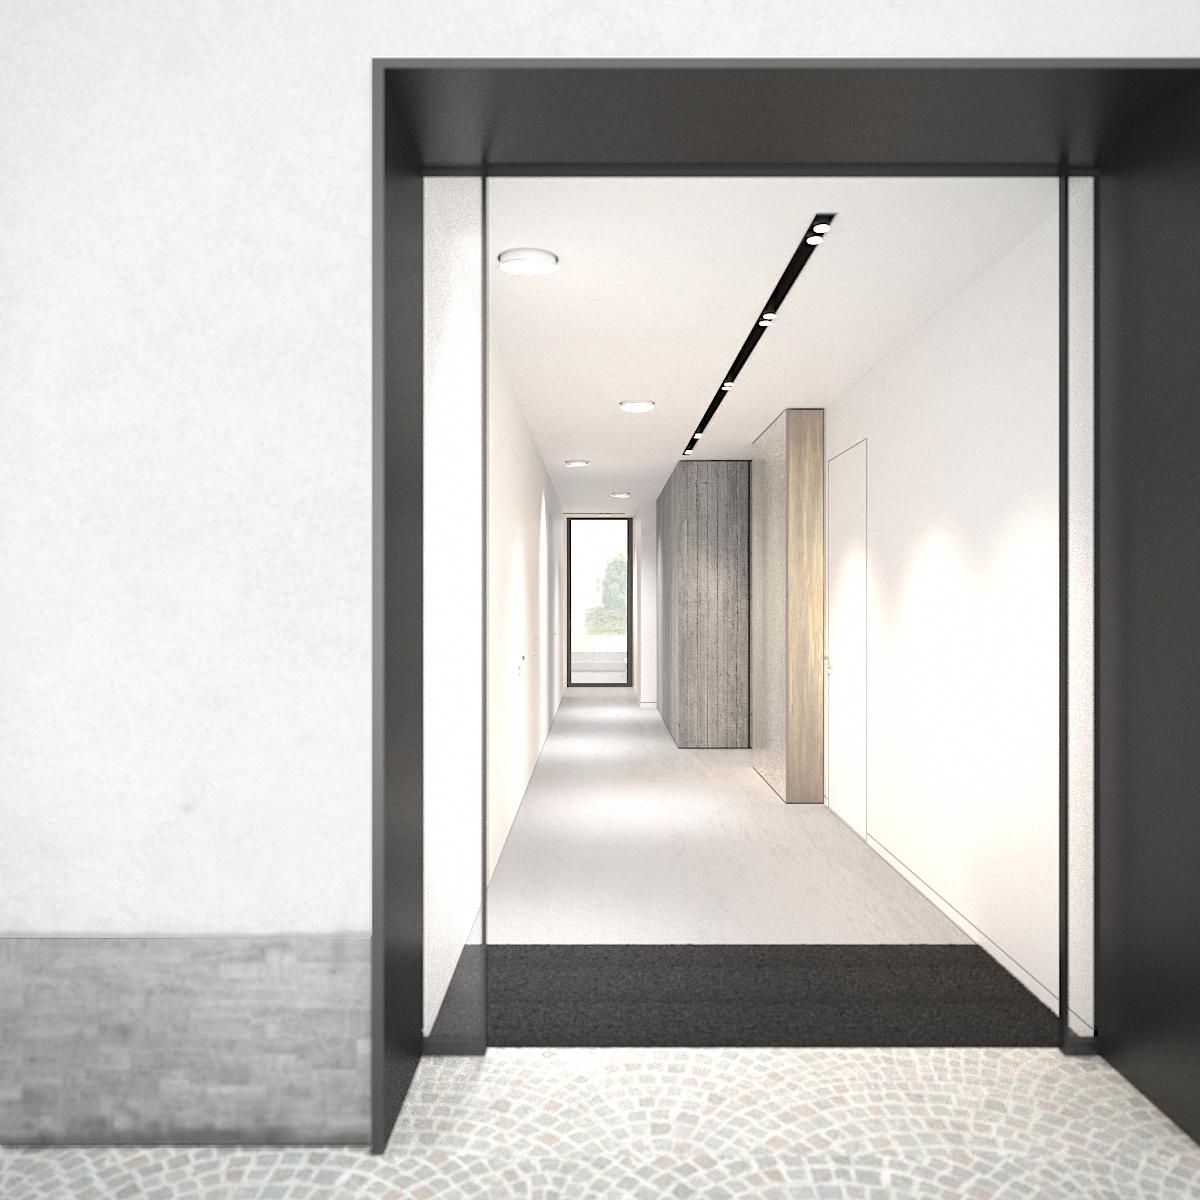 Affordable interior design services bmw1interior - Affordable interior design services ...